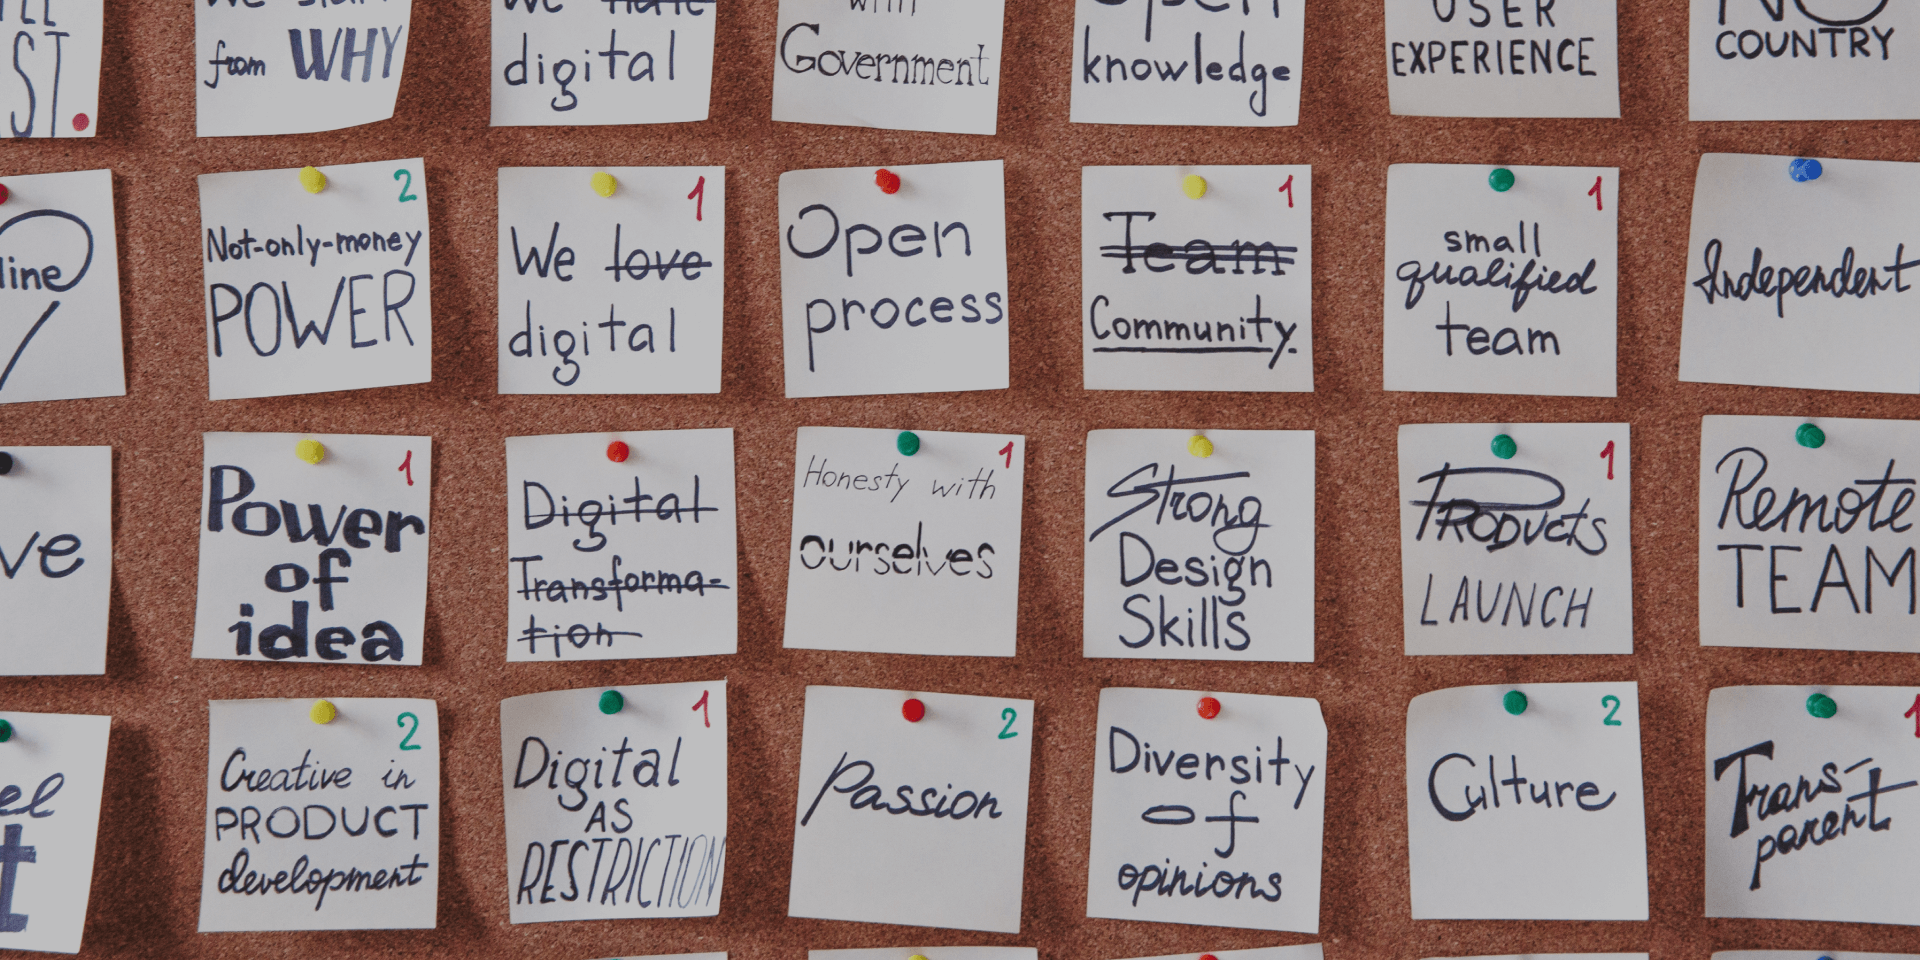 Pensamiento divergente on-line. Adaptando los frameworks